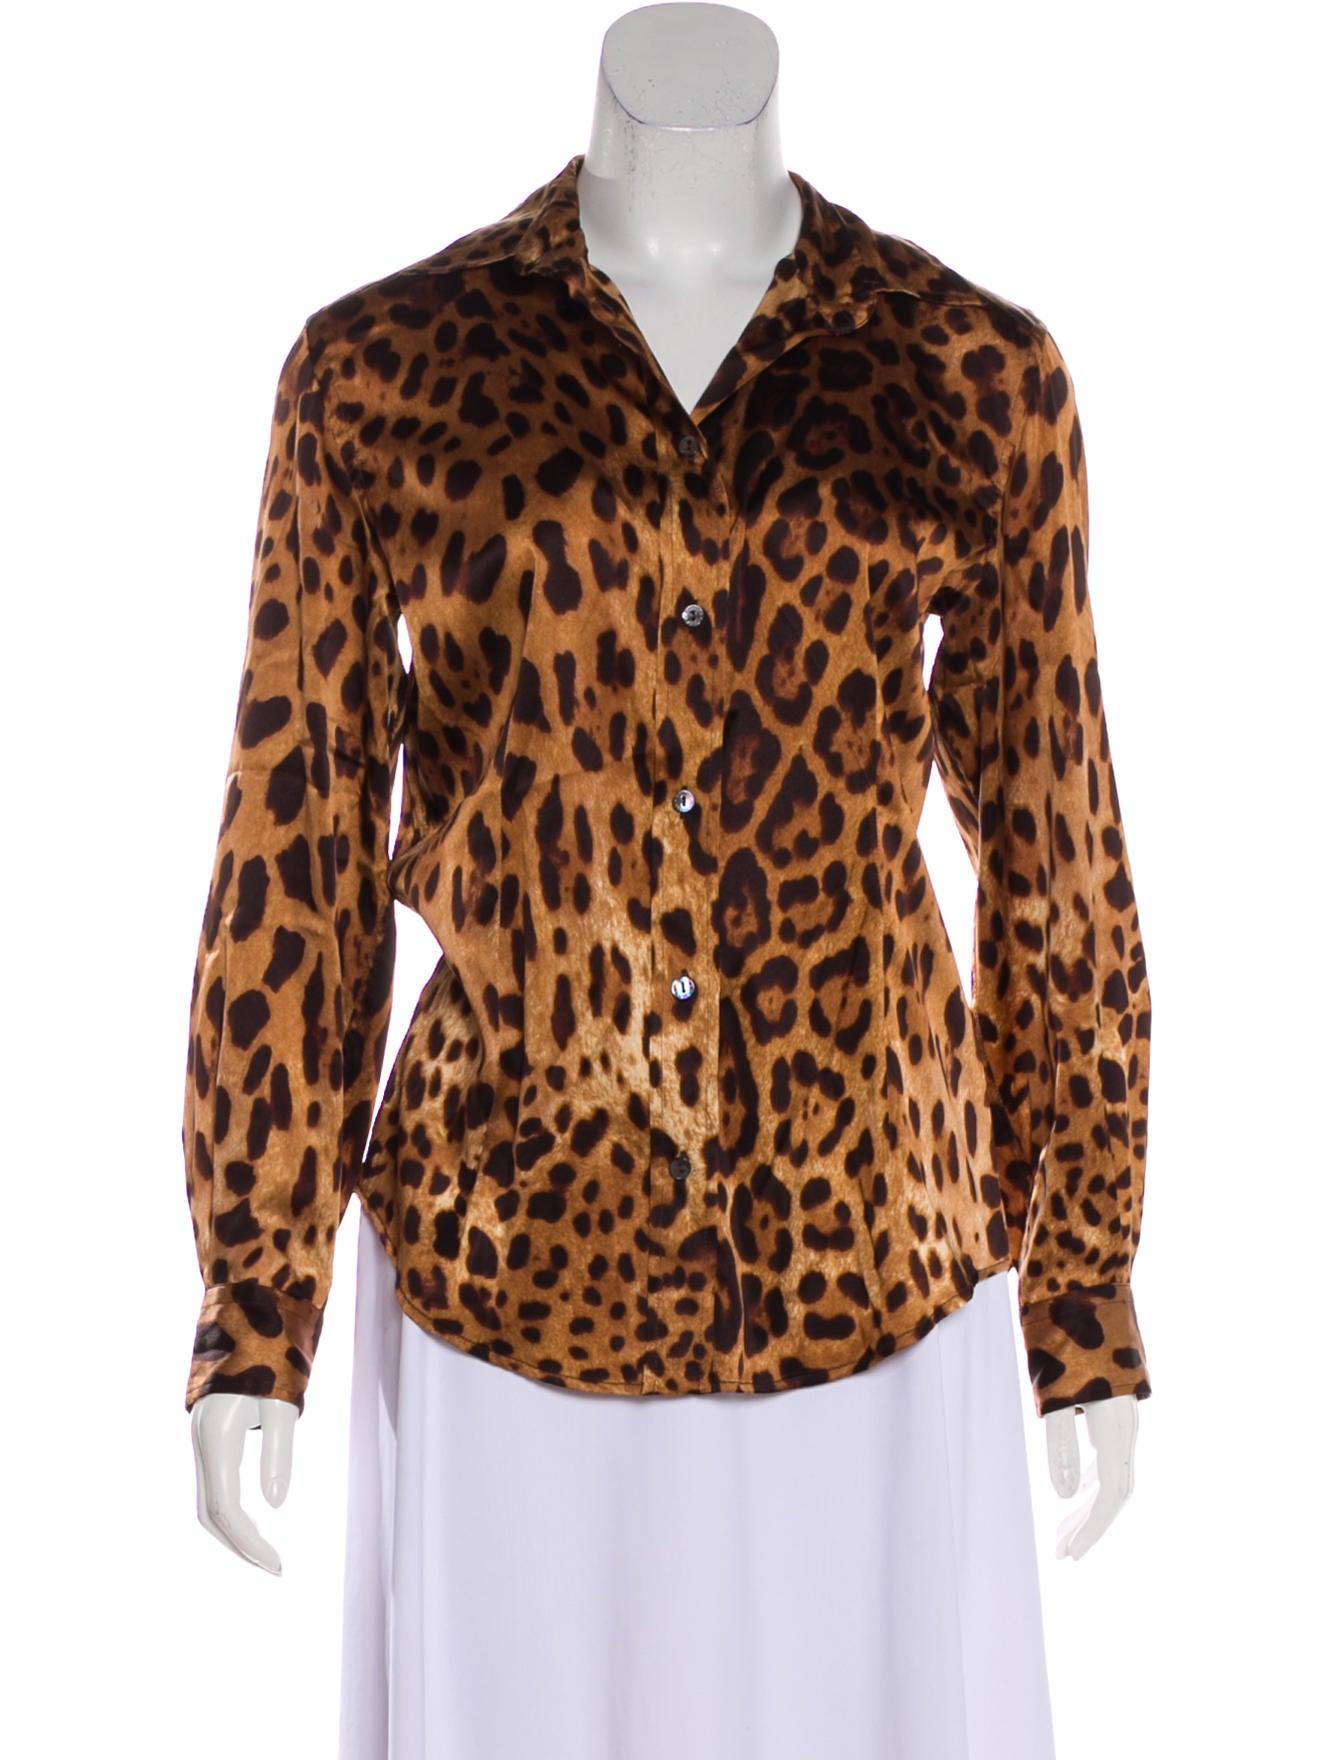 3e0975a110565d Dolce   Gabbana Silk Animal Print Top - Clothing - DAG120158